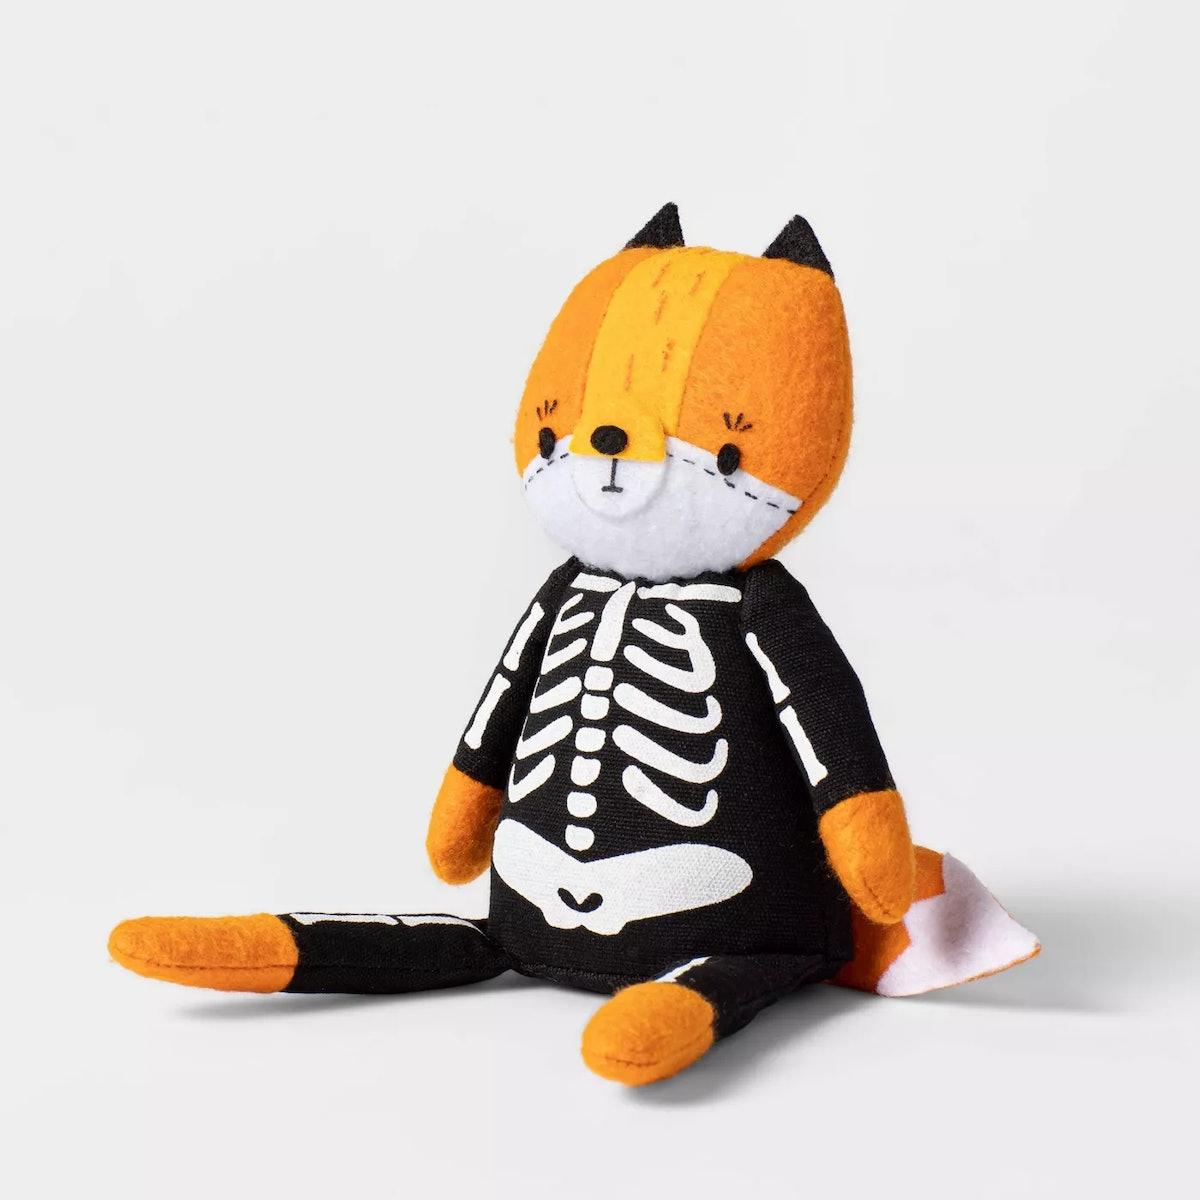 Trick or Treat Fox Skeleton Halloween Decorative Figurine - Hyde & EEK! Boutique